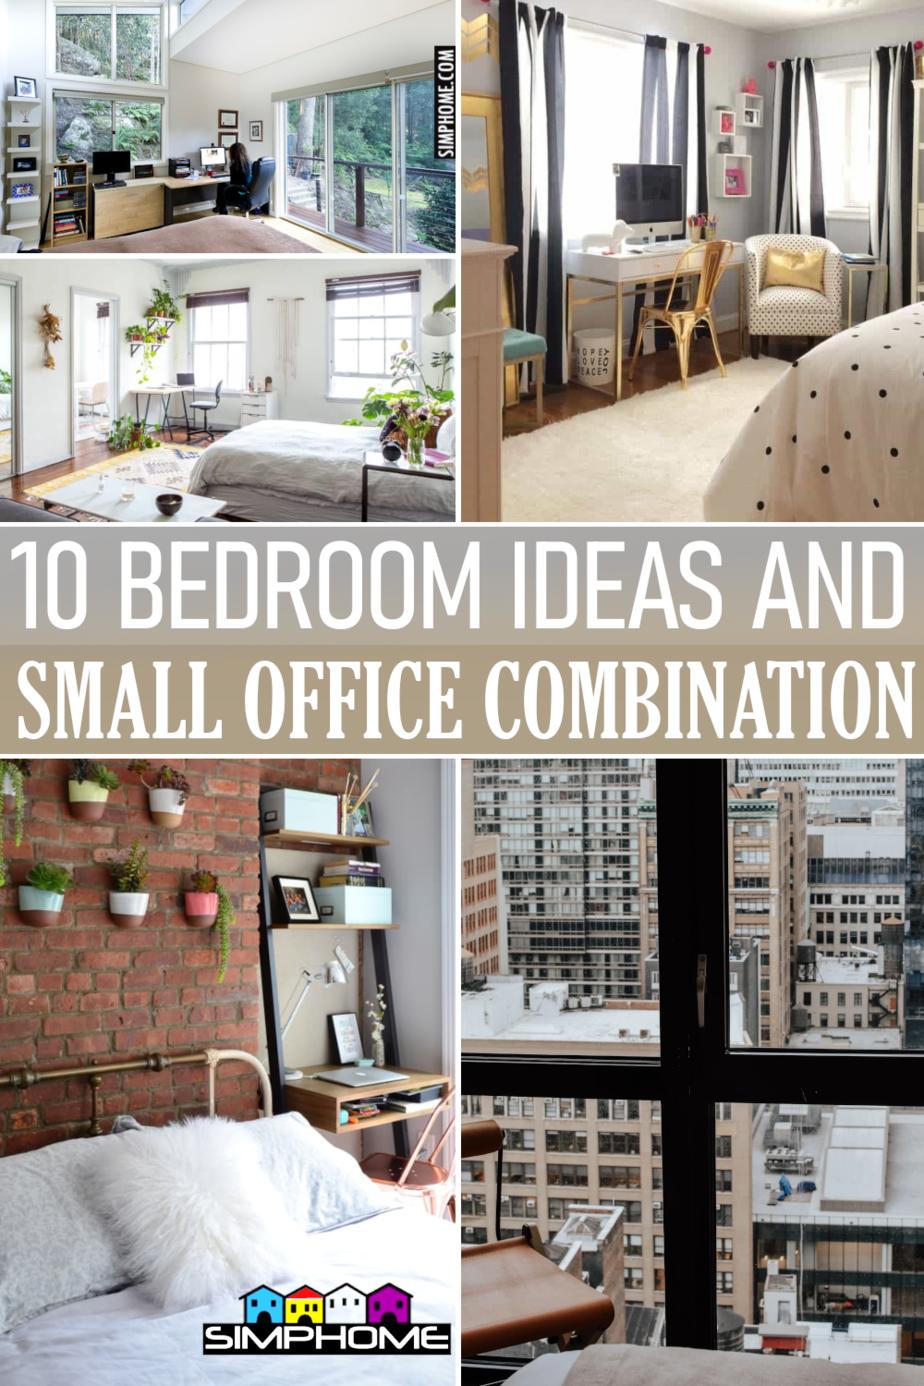 10 Office Bedroom Combo Ideas via Simphome.comFeatured